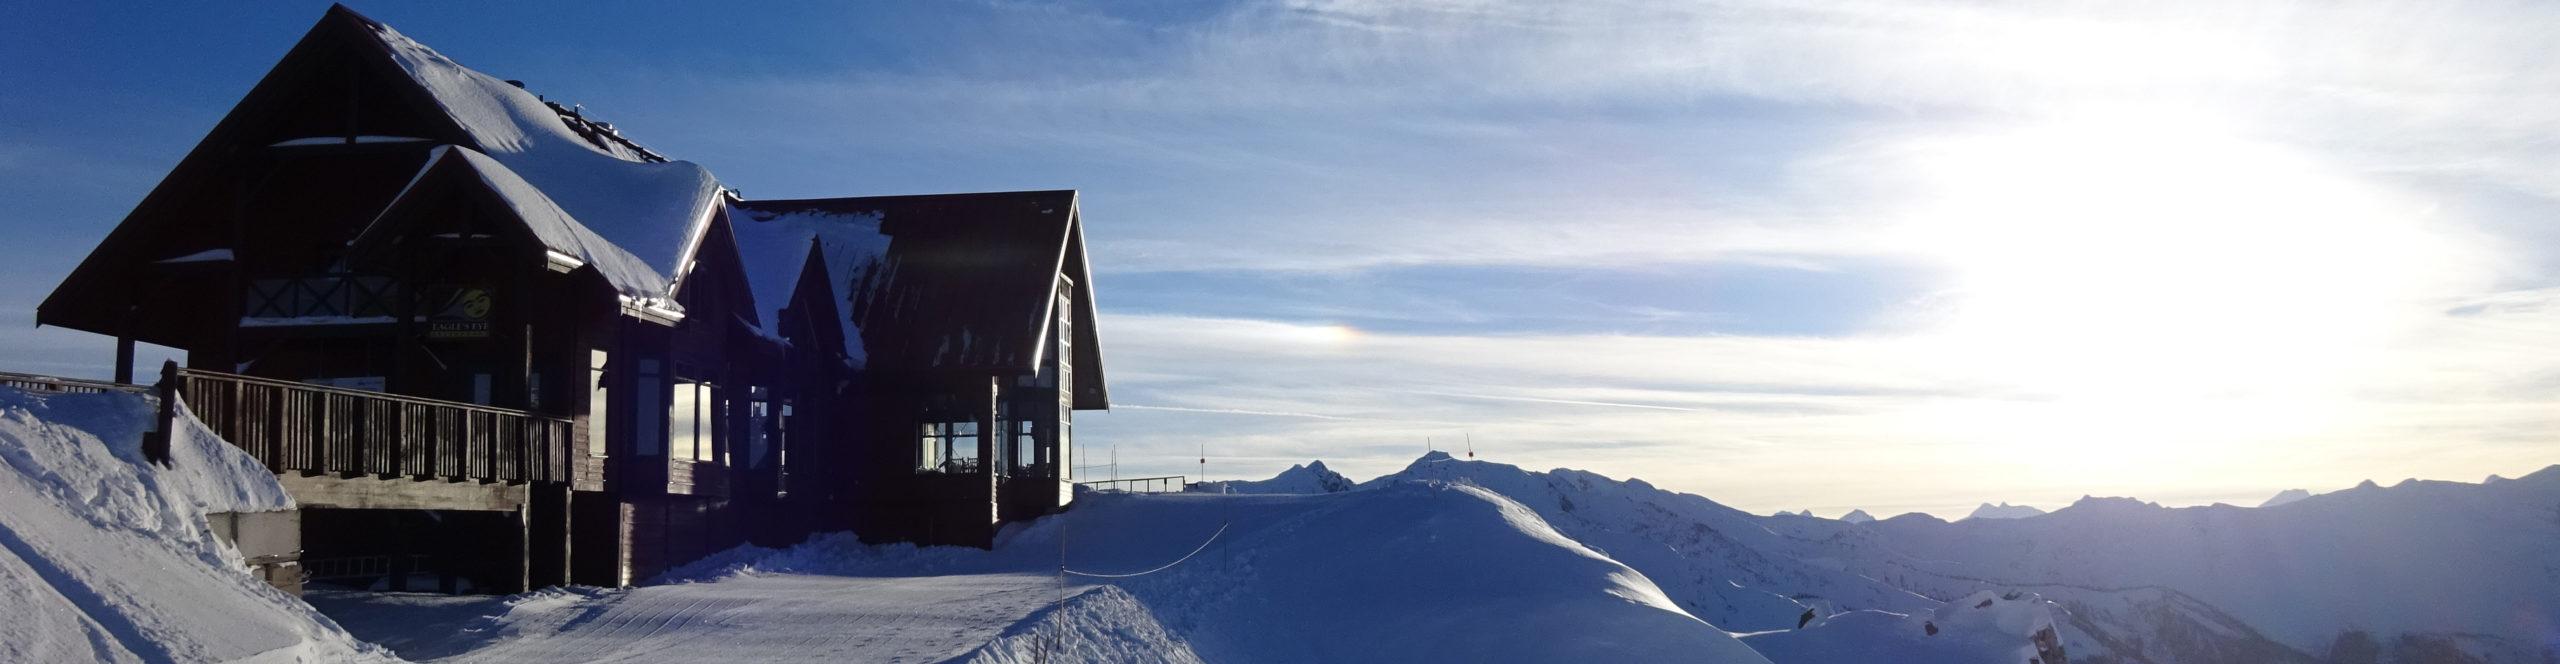 KANADA – Skisafari in den Rocky Mountains – 5 Skigebiete – 8 Skitage